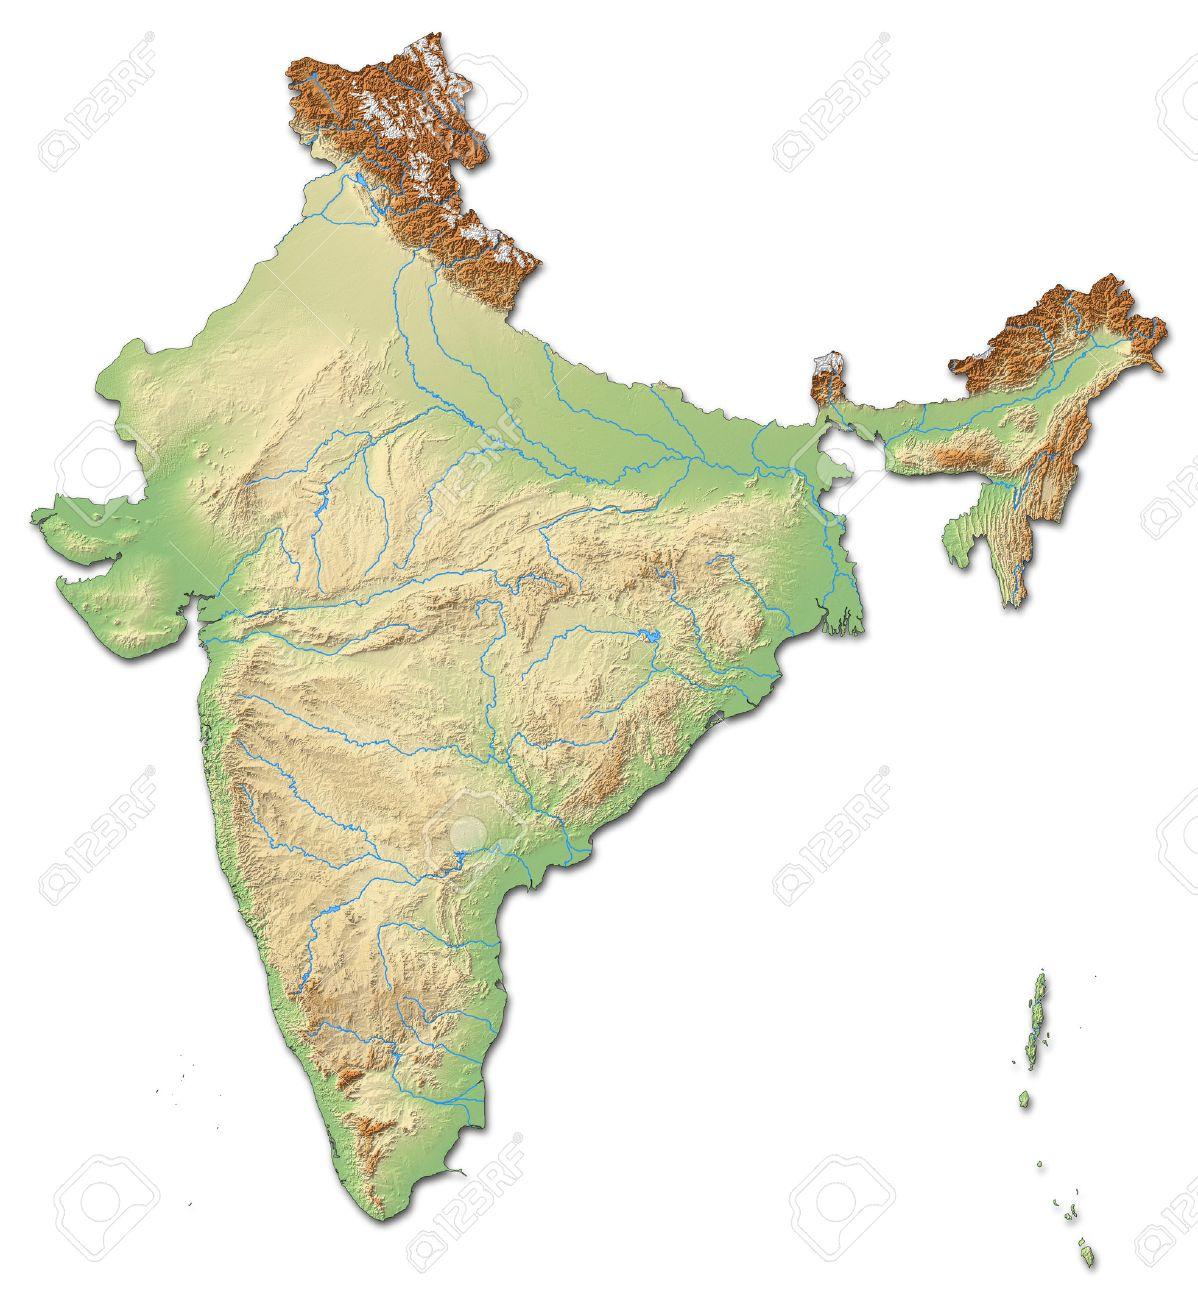 Carte Inde Relief.Carte De L Inde Relief Avec Relief Ombre